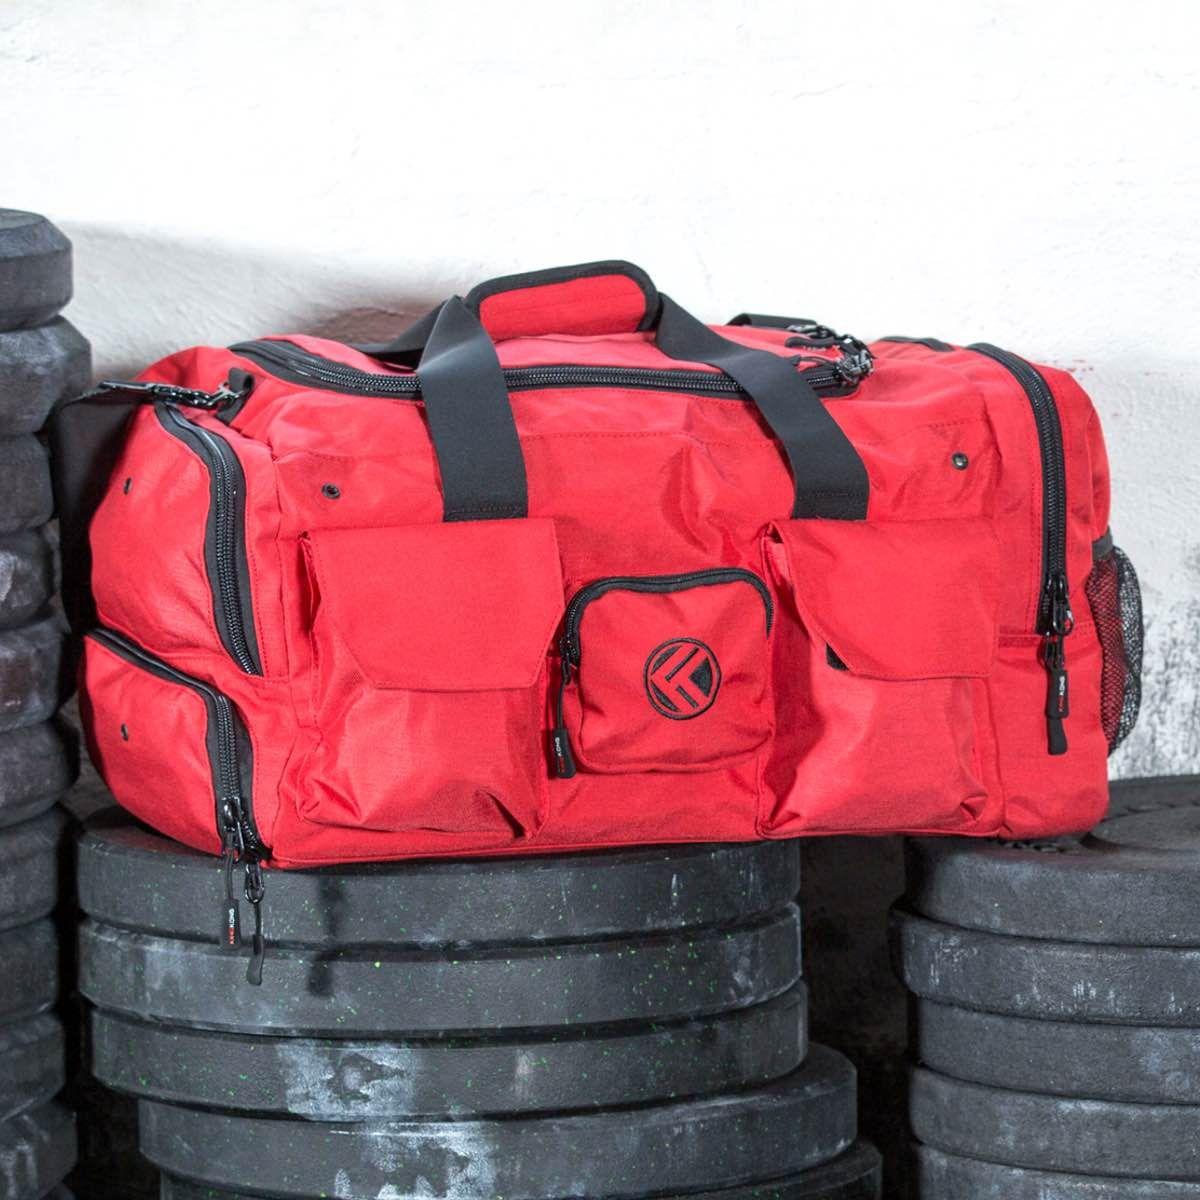 The Original King Kong Bag 3 0 Elite Fitness Man Bags